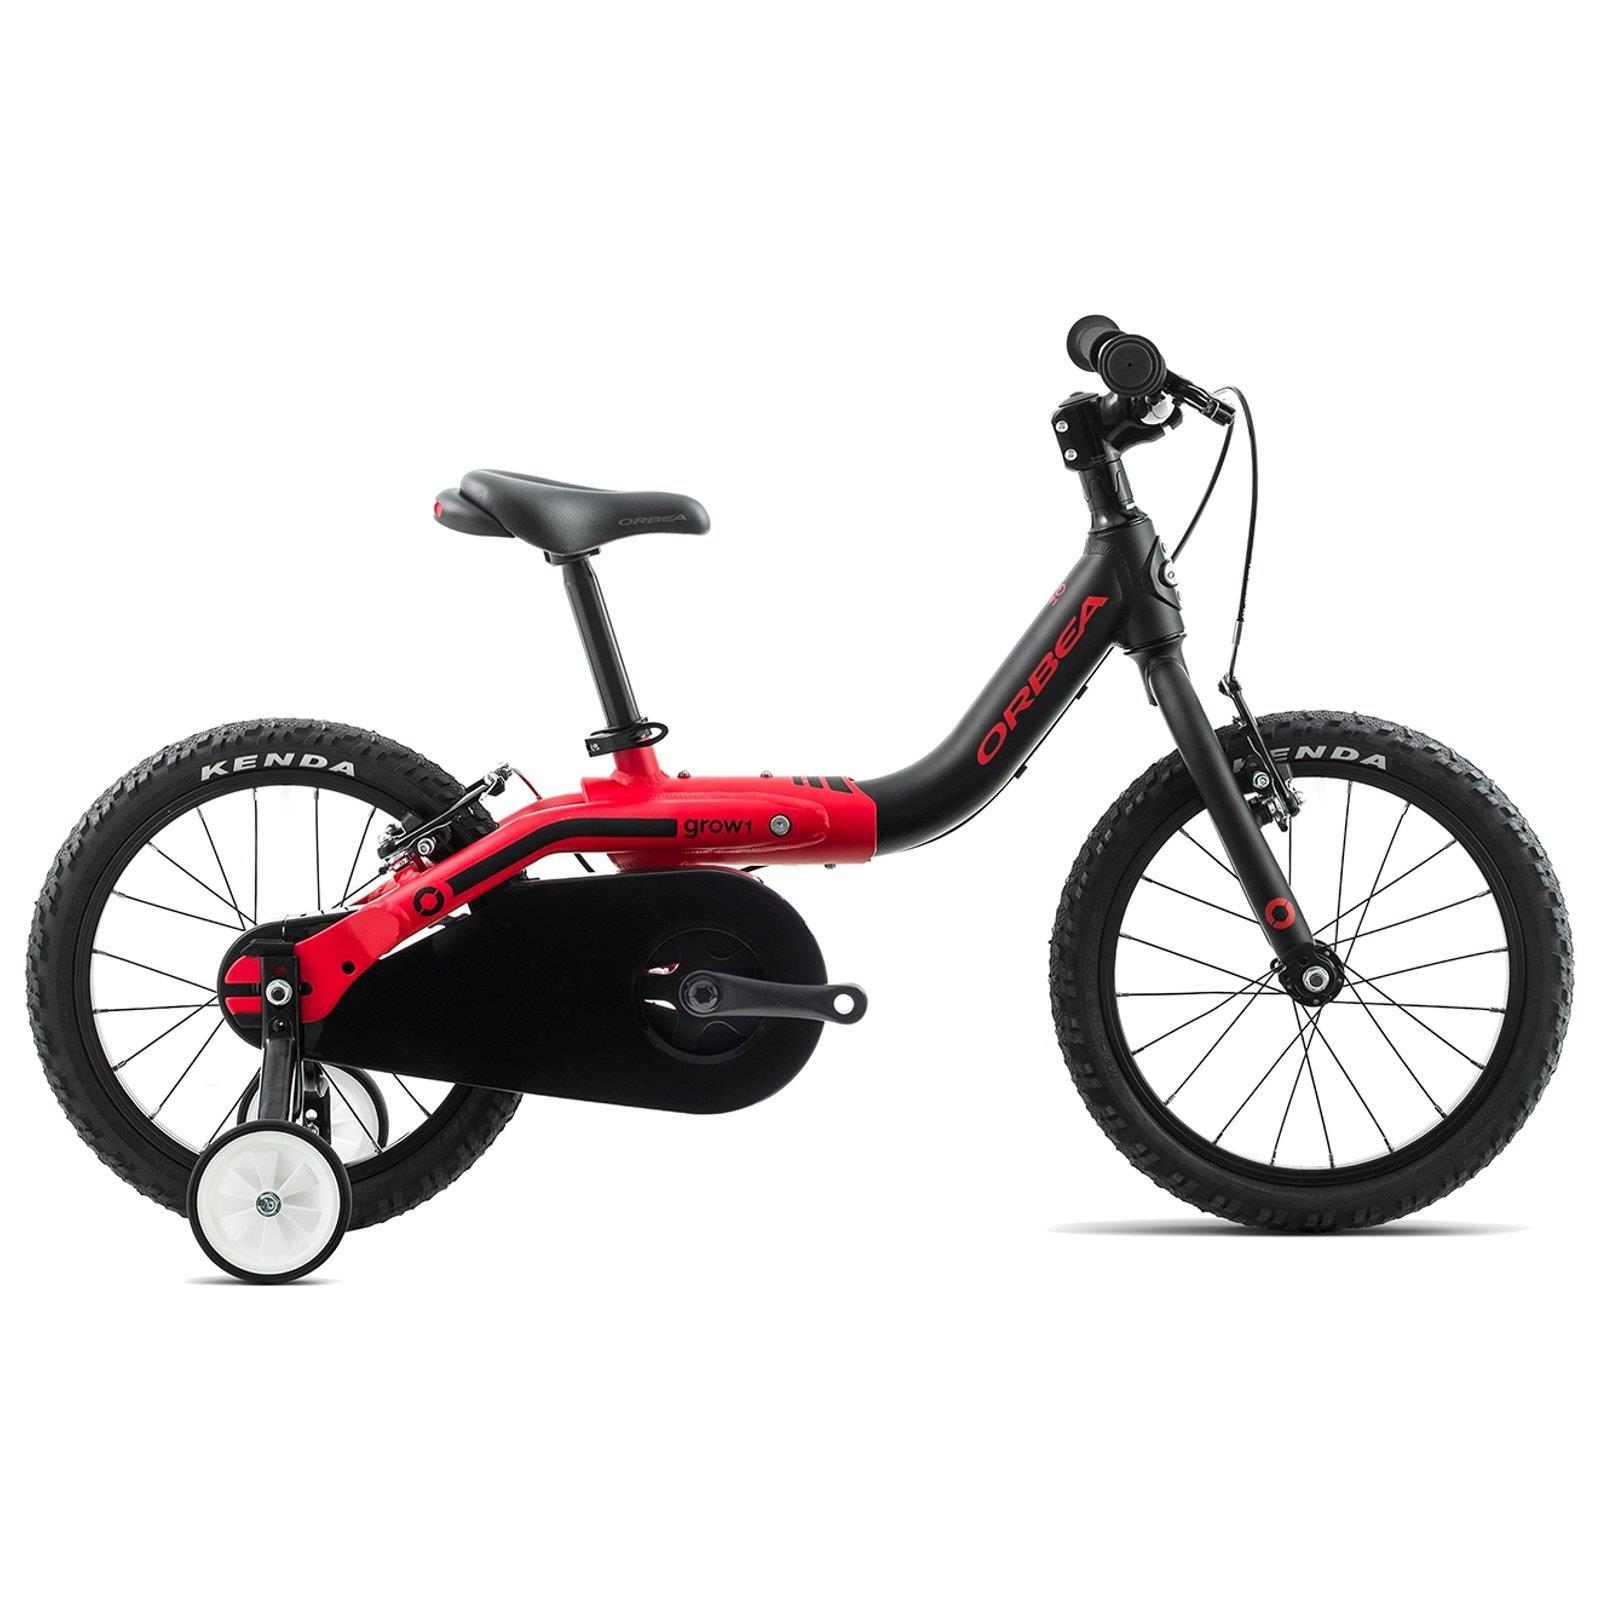 orbea mx grow kinder fahrrad jugend rad 16 20 24 26 zoll. Black Bedroom Furniture Sets. Home Design Ideas